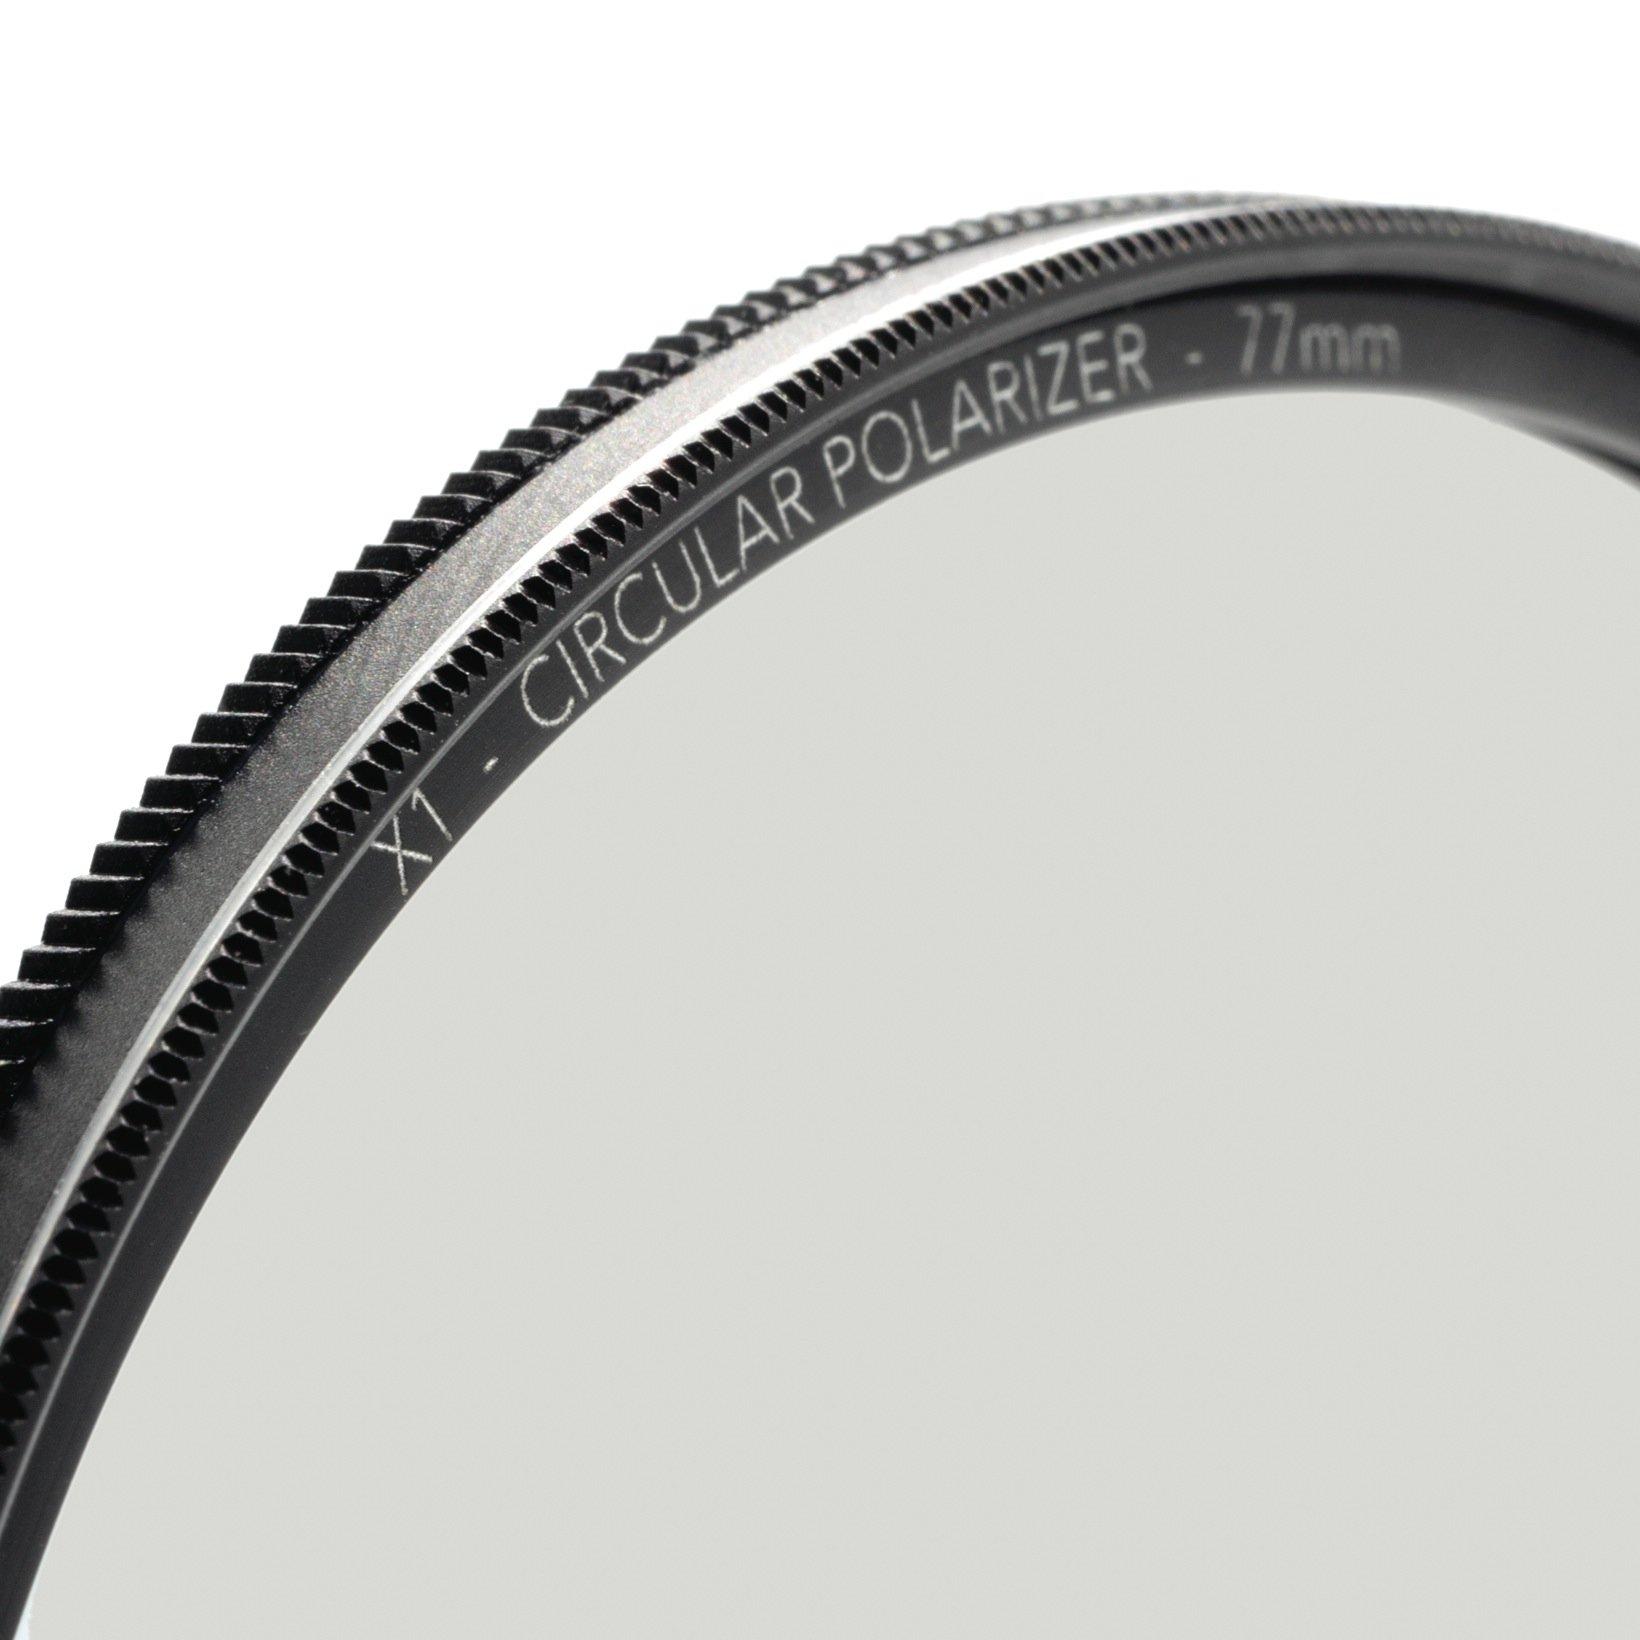 77mm X1 Circular Polarizer, MRC8, Ultra-slim, Weather Sealed + FREE Mircofiber Lens Cloth